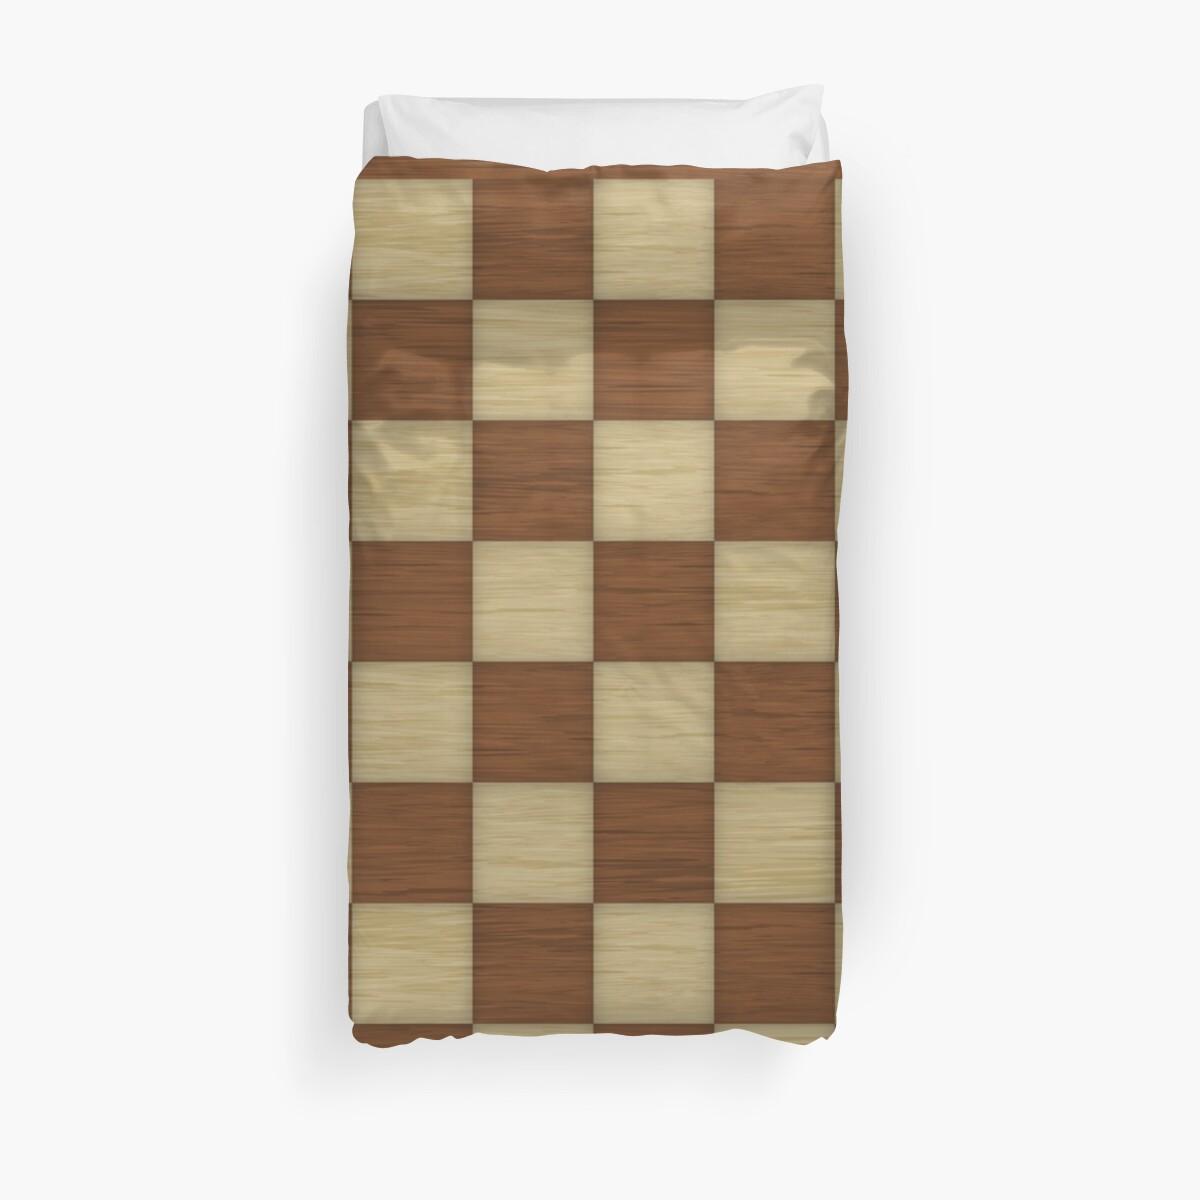 Wood Chess Board by CreatedProto